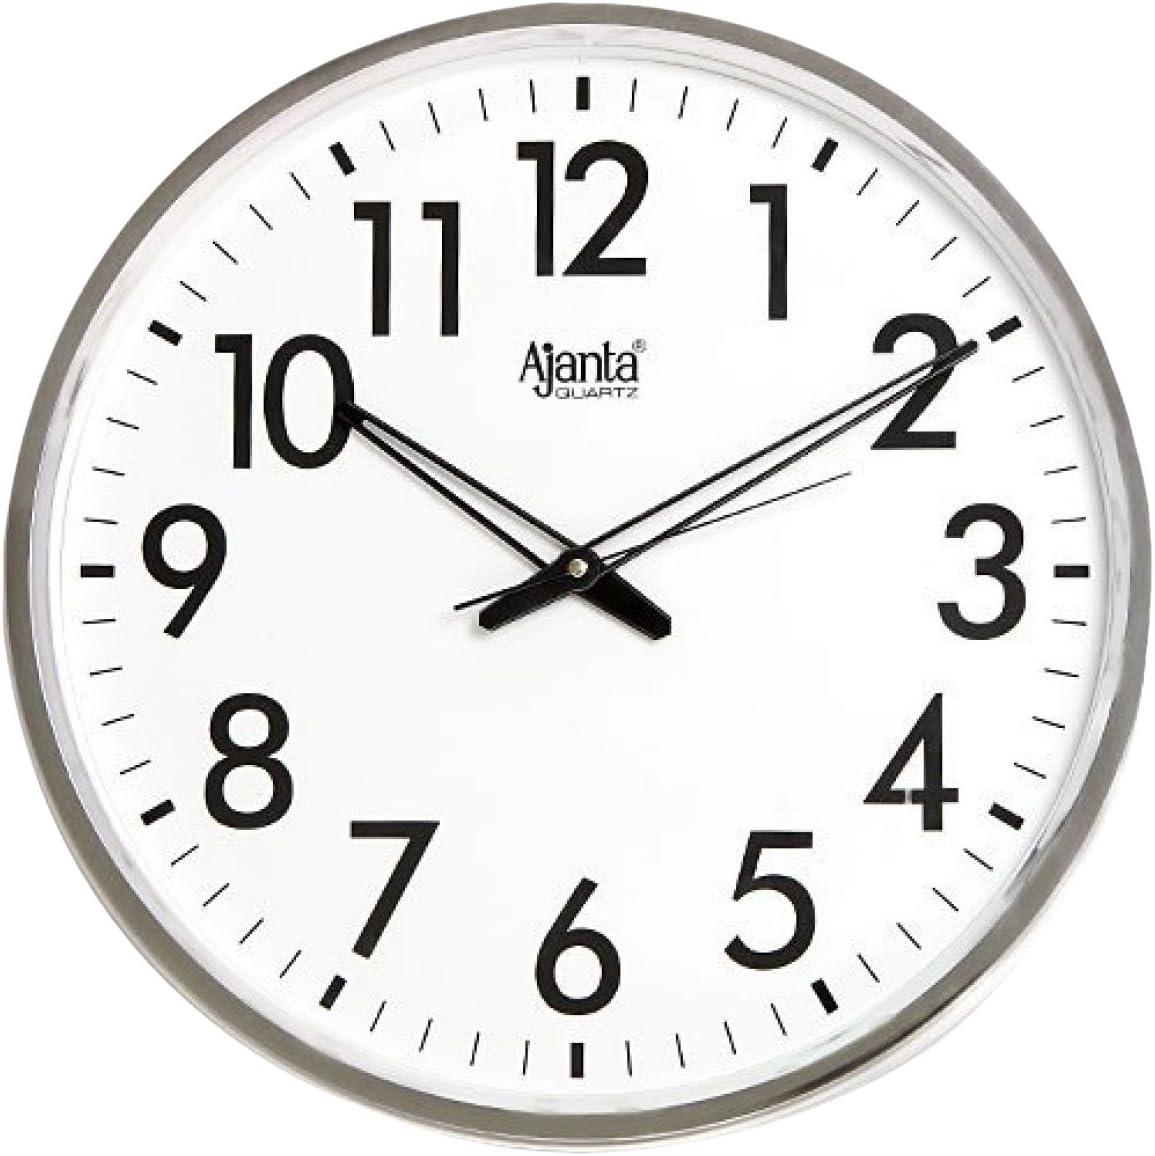 Ajanta Premium Analog Wall Clock Silent Movement